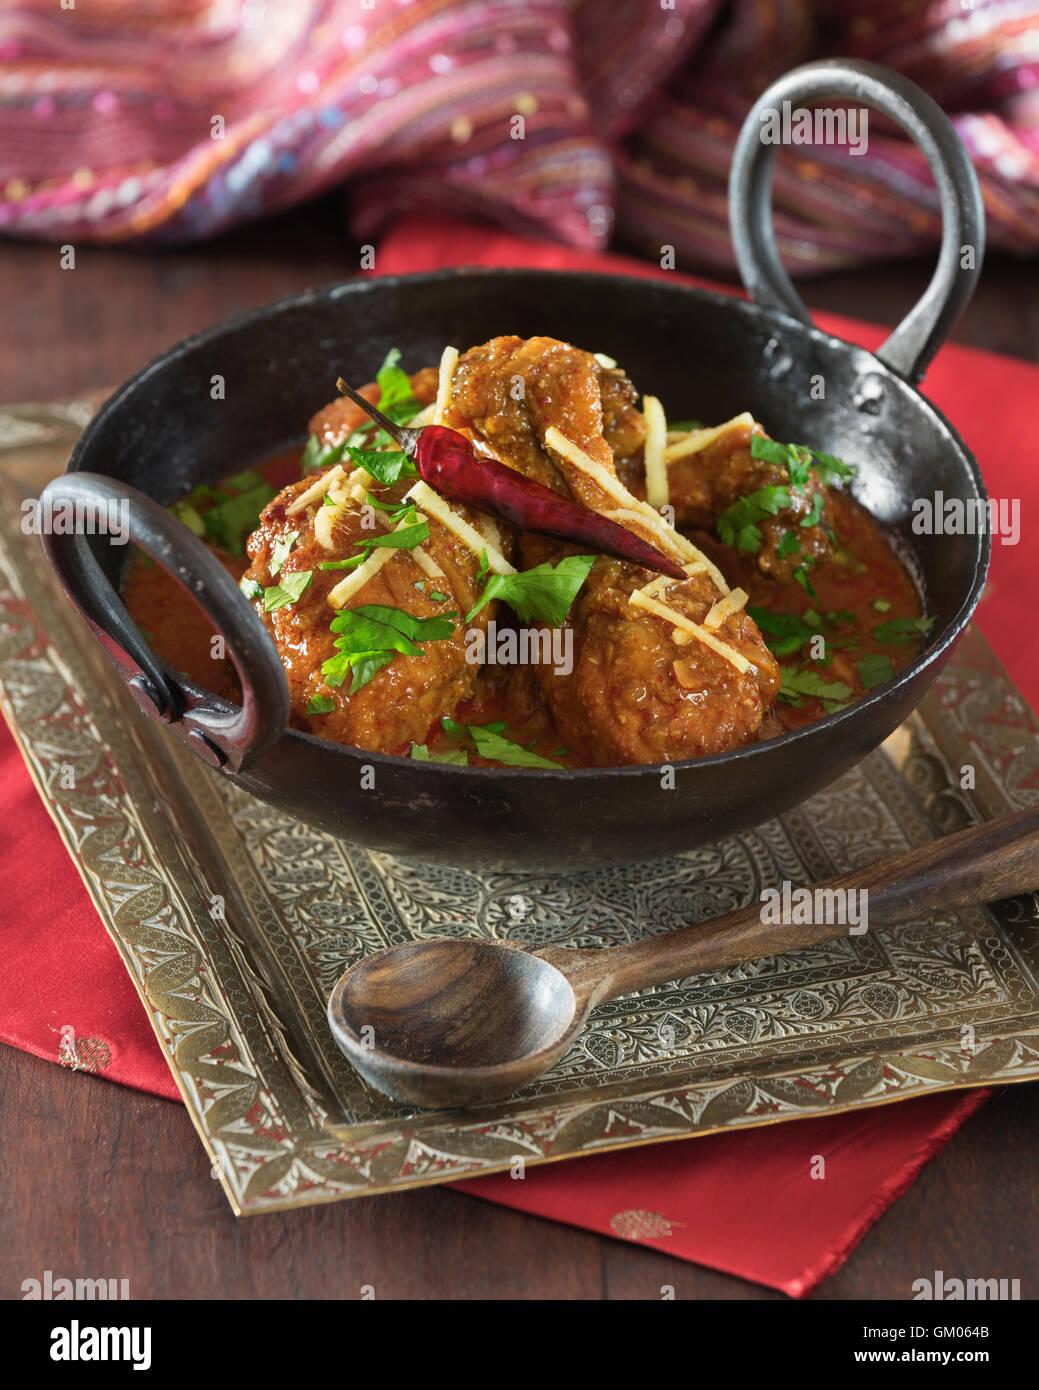 Kadai chicken  Karahi murgh  Food India Pakistan Stock Photo